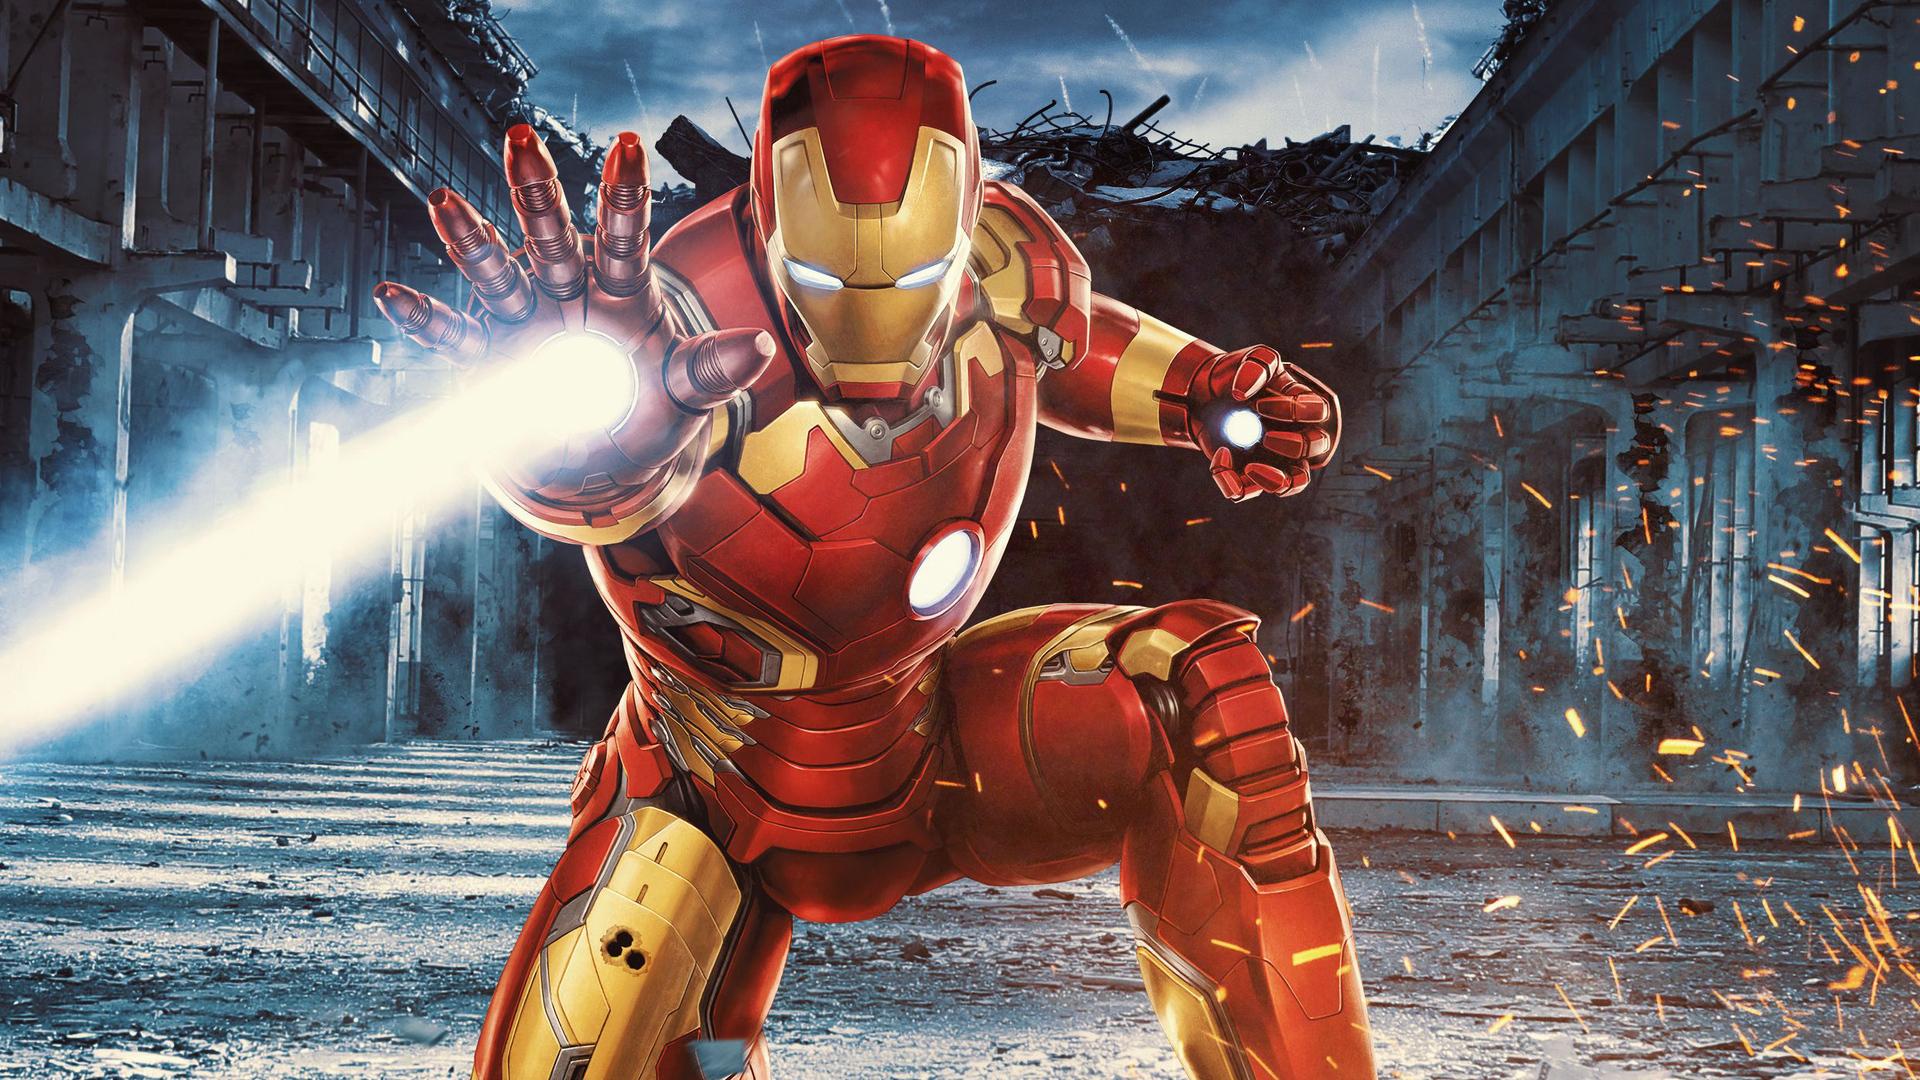 1920x1080 Iron Man 3 Art Laptop Full Hd 1080p Hd 4k Wallpapers